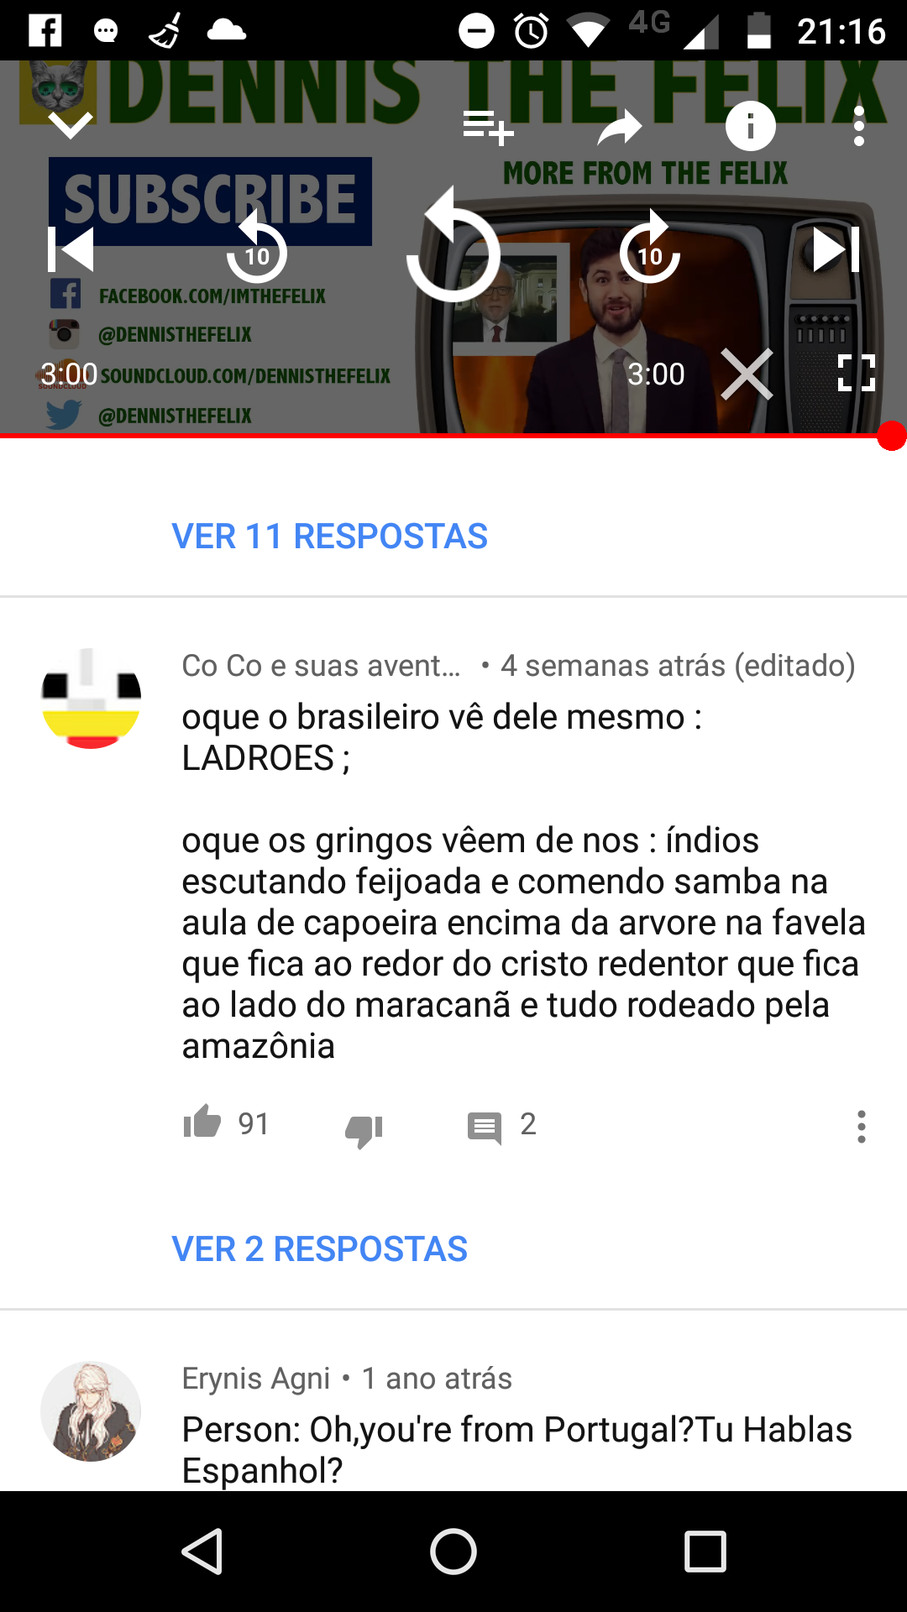 """Escutando Feijoando e Comendo Samba"" - meme"